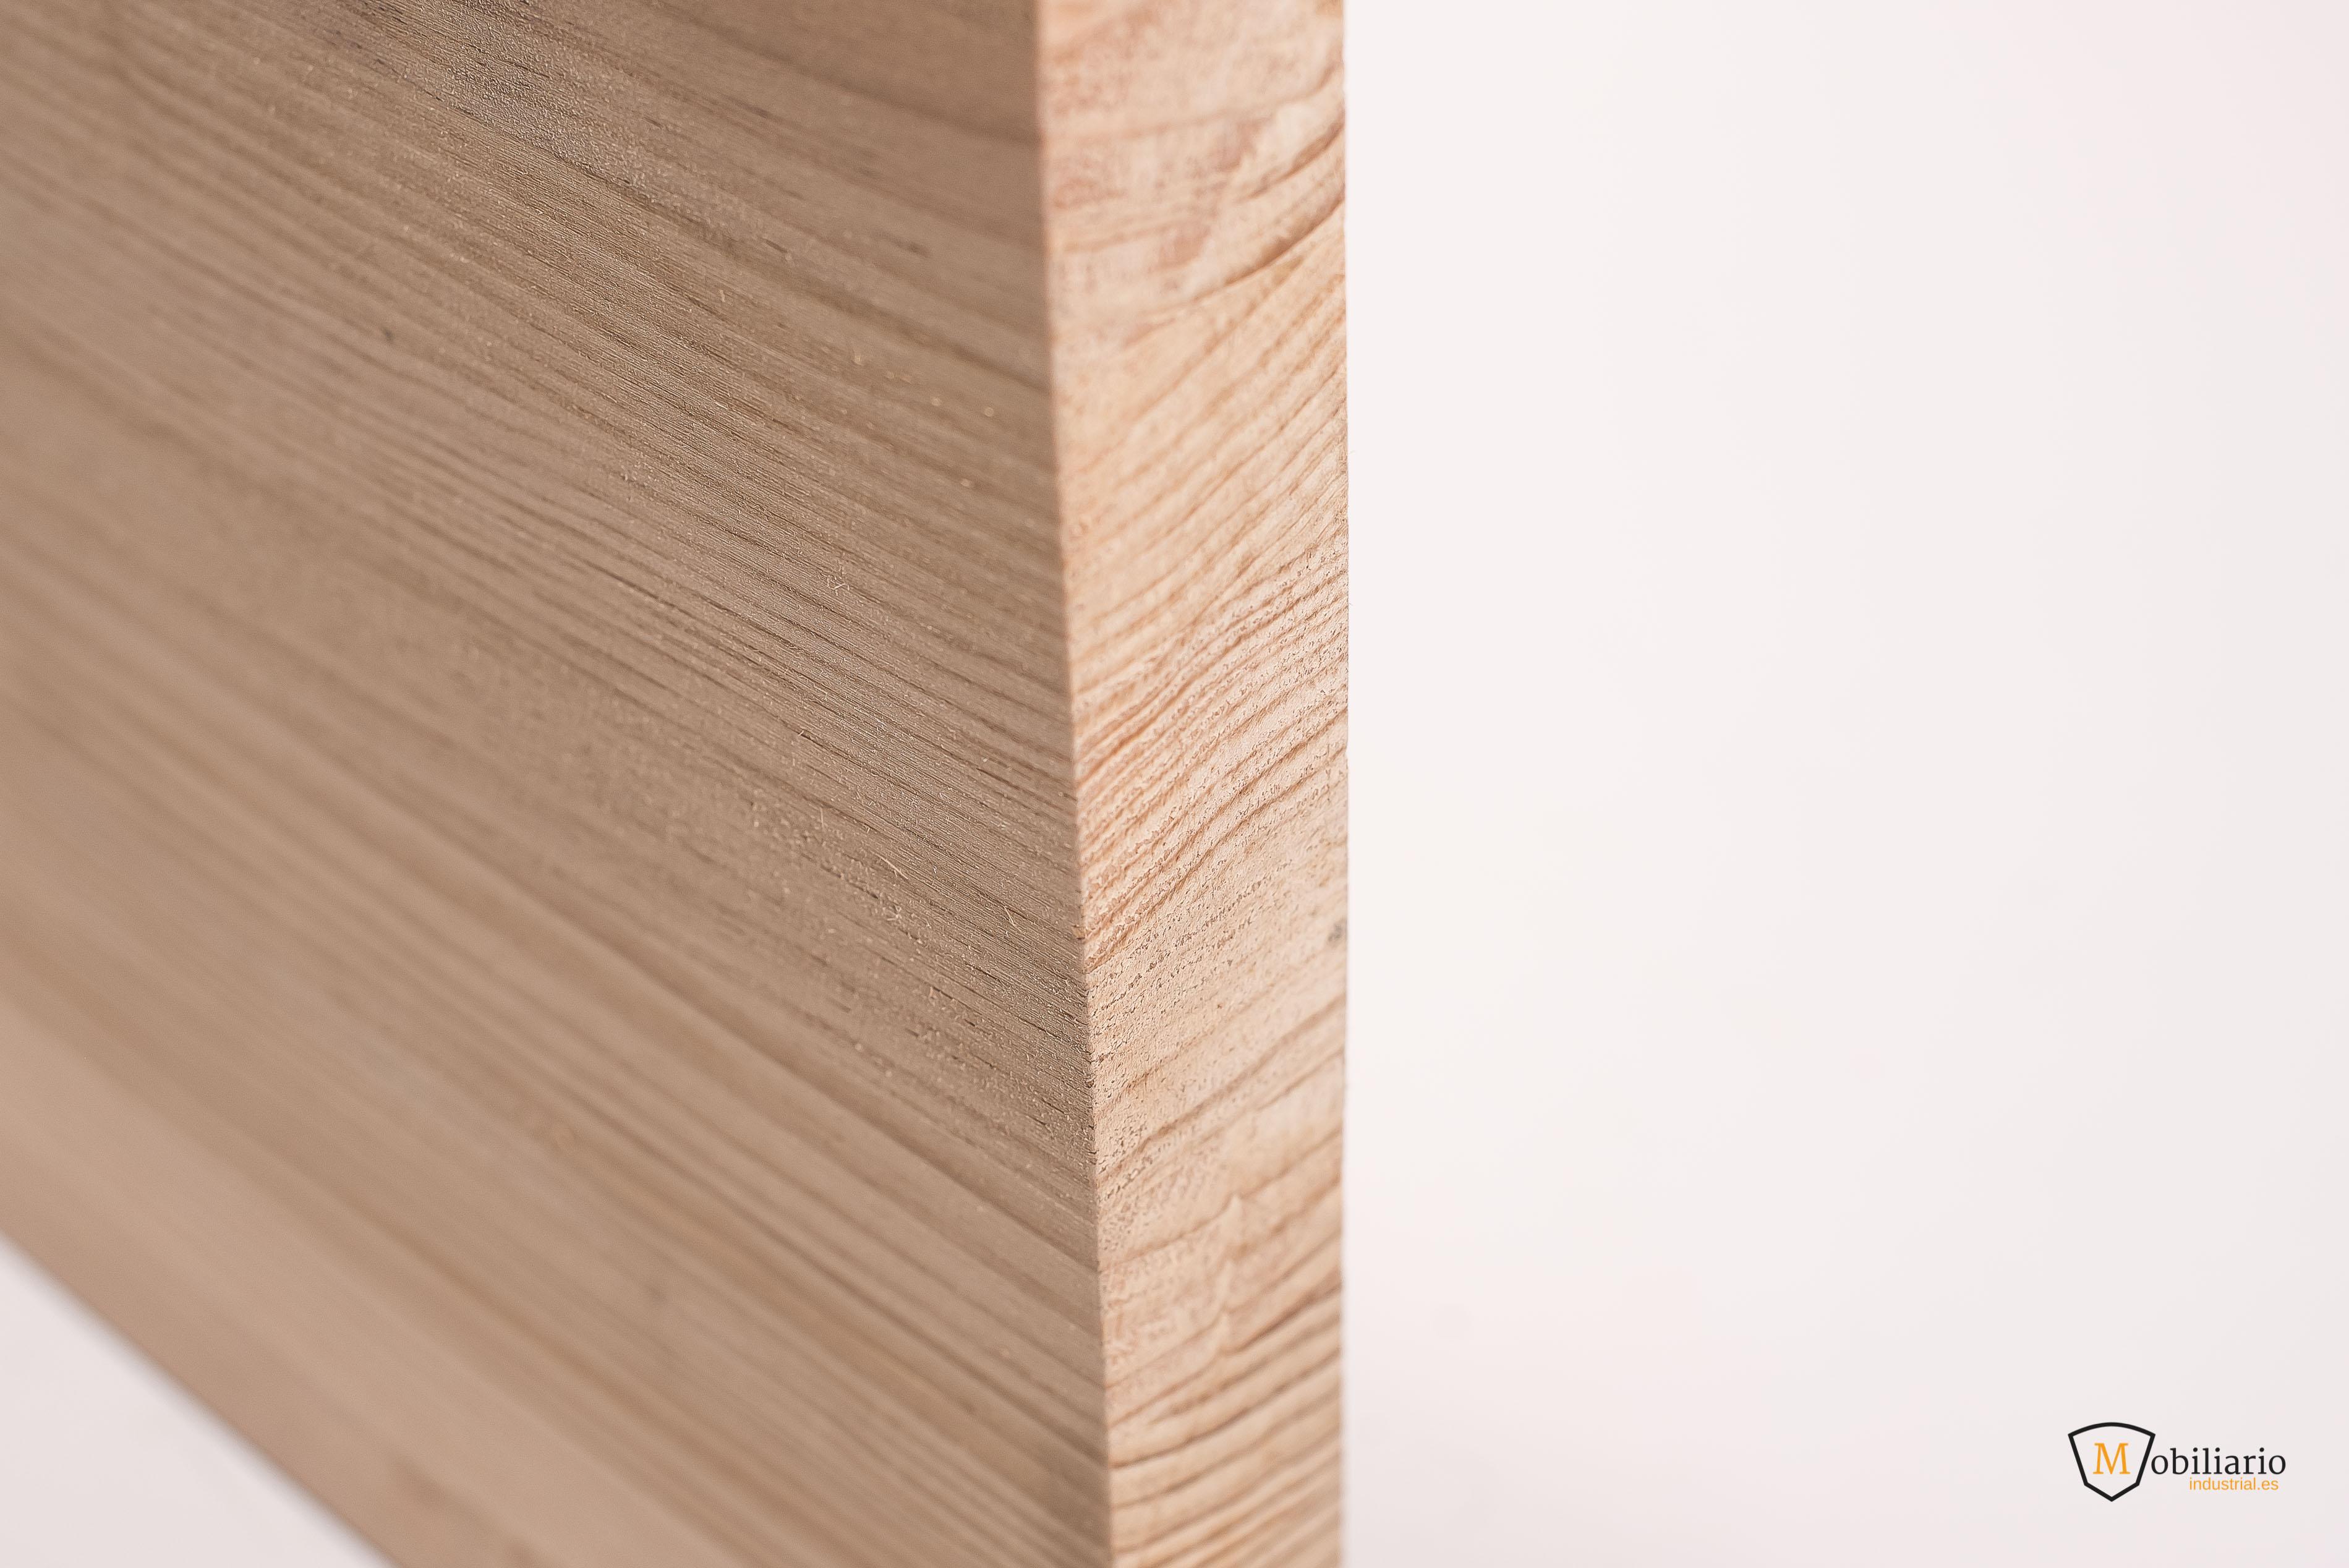 fabricar una mesa con madera maciza de pino